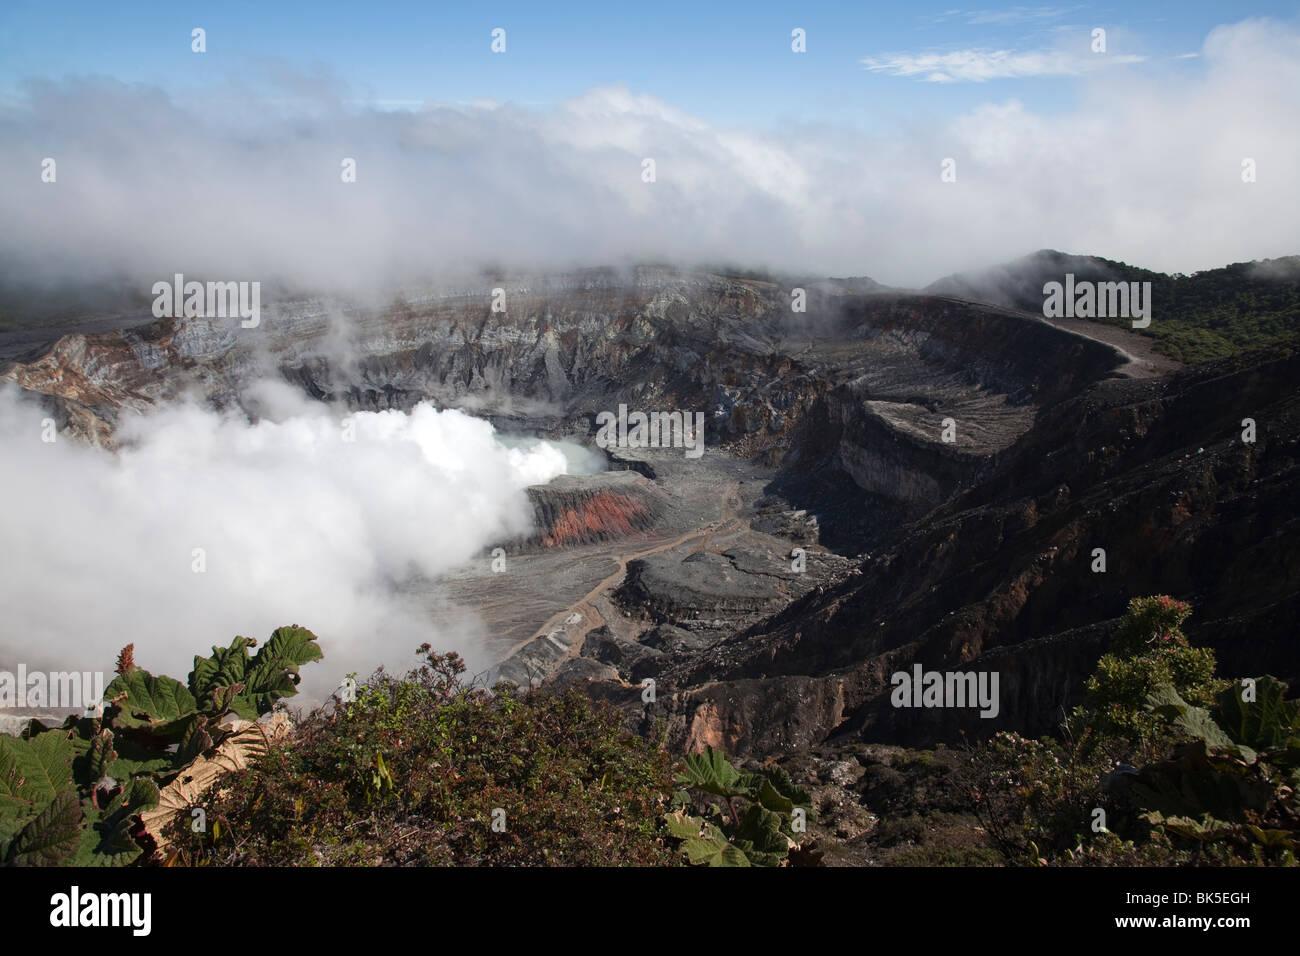 Active volcano smoke erupting from volcano crater - Stock Image